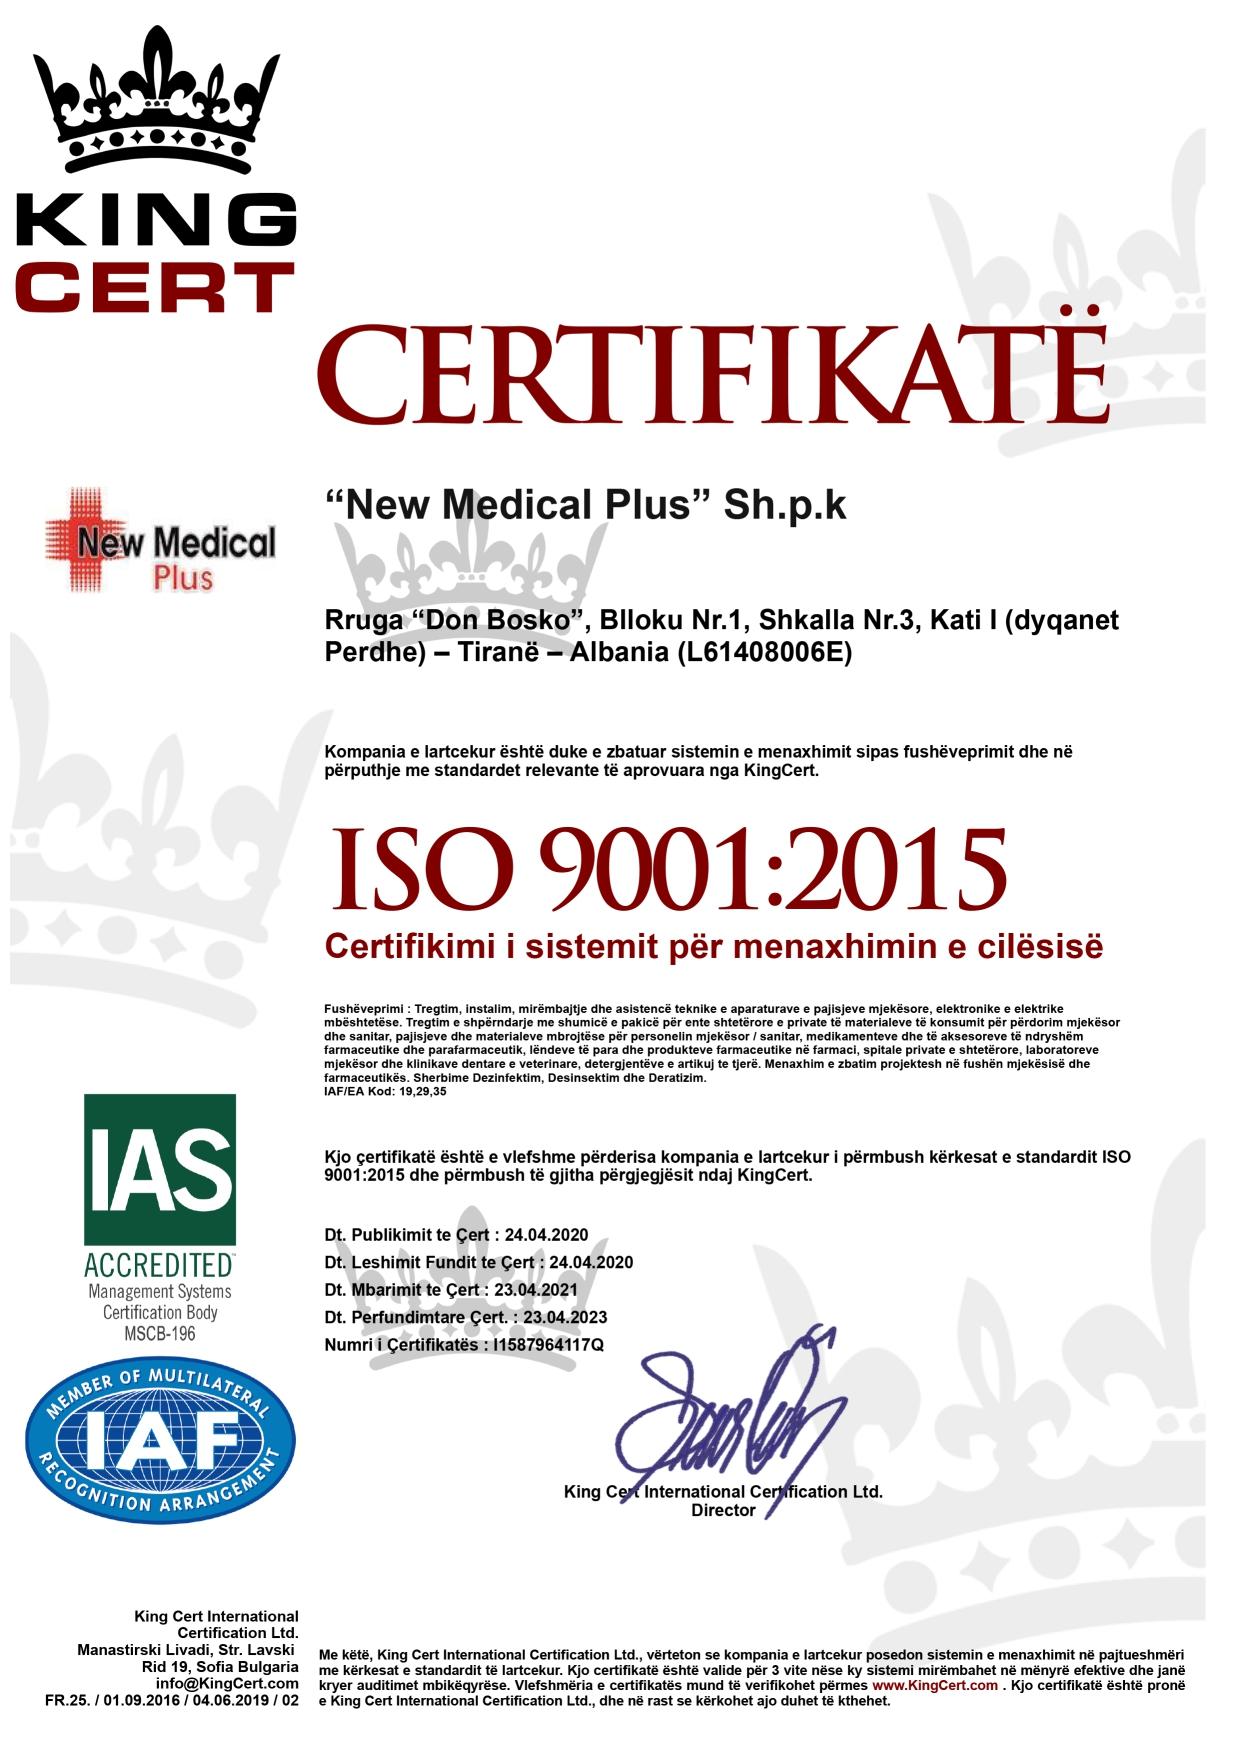 NEW MEDICAL PLUS WEBSITE CERTIFIKATA 4